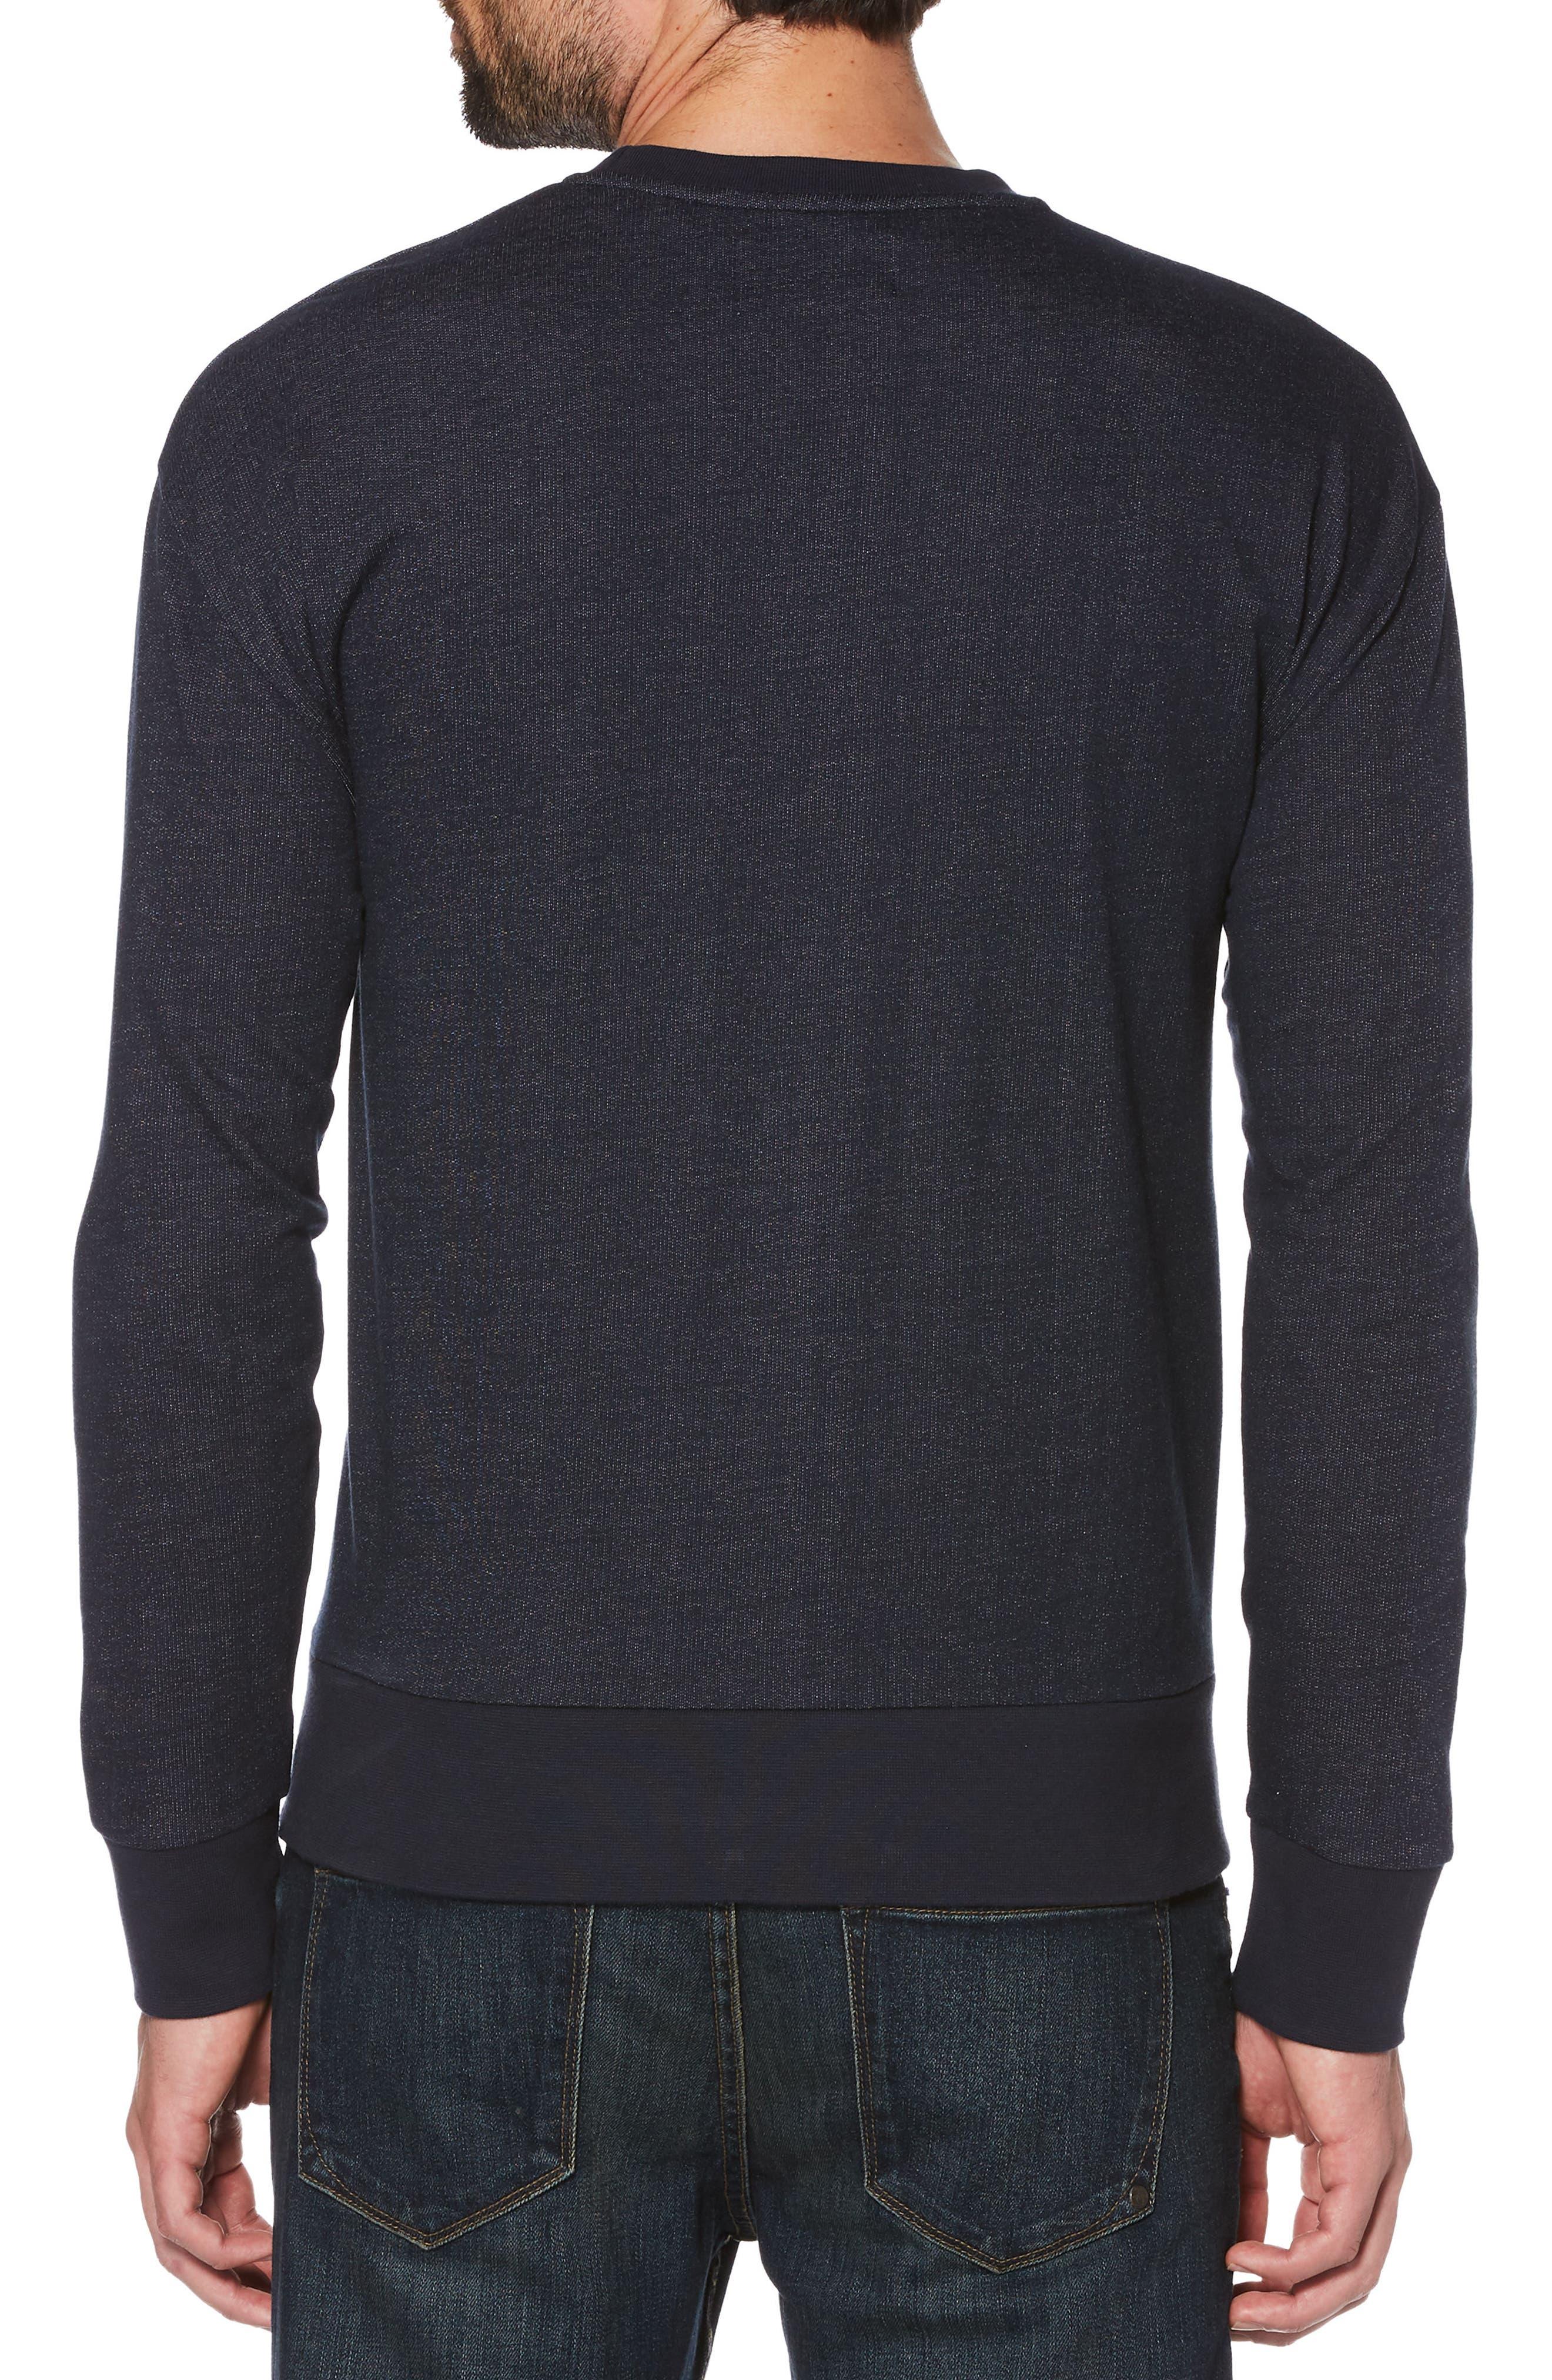 Lemon Crewneck Sweatshirt,                             Alternate thumbnail 2, color,                             Dark Sapphire